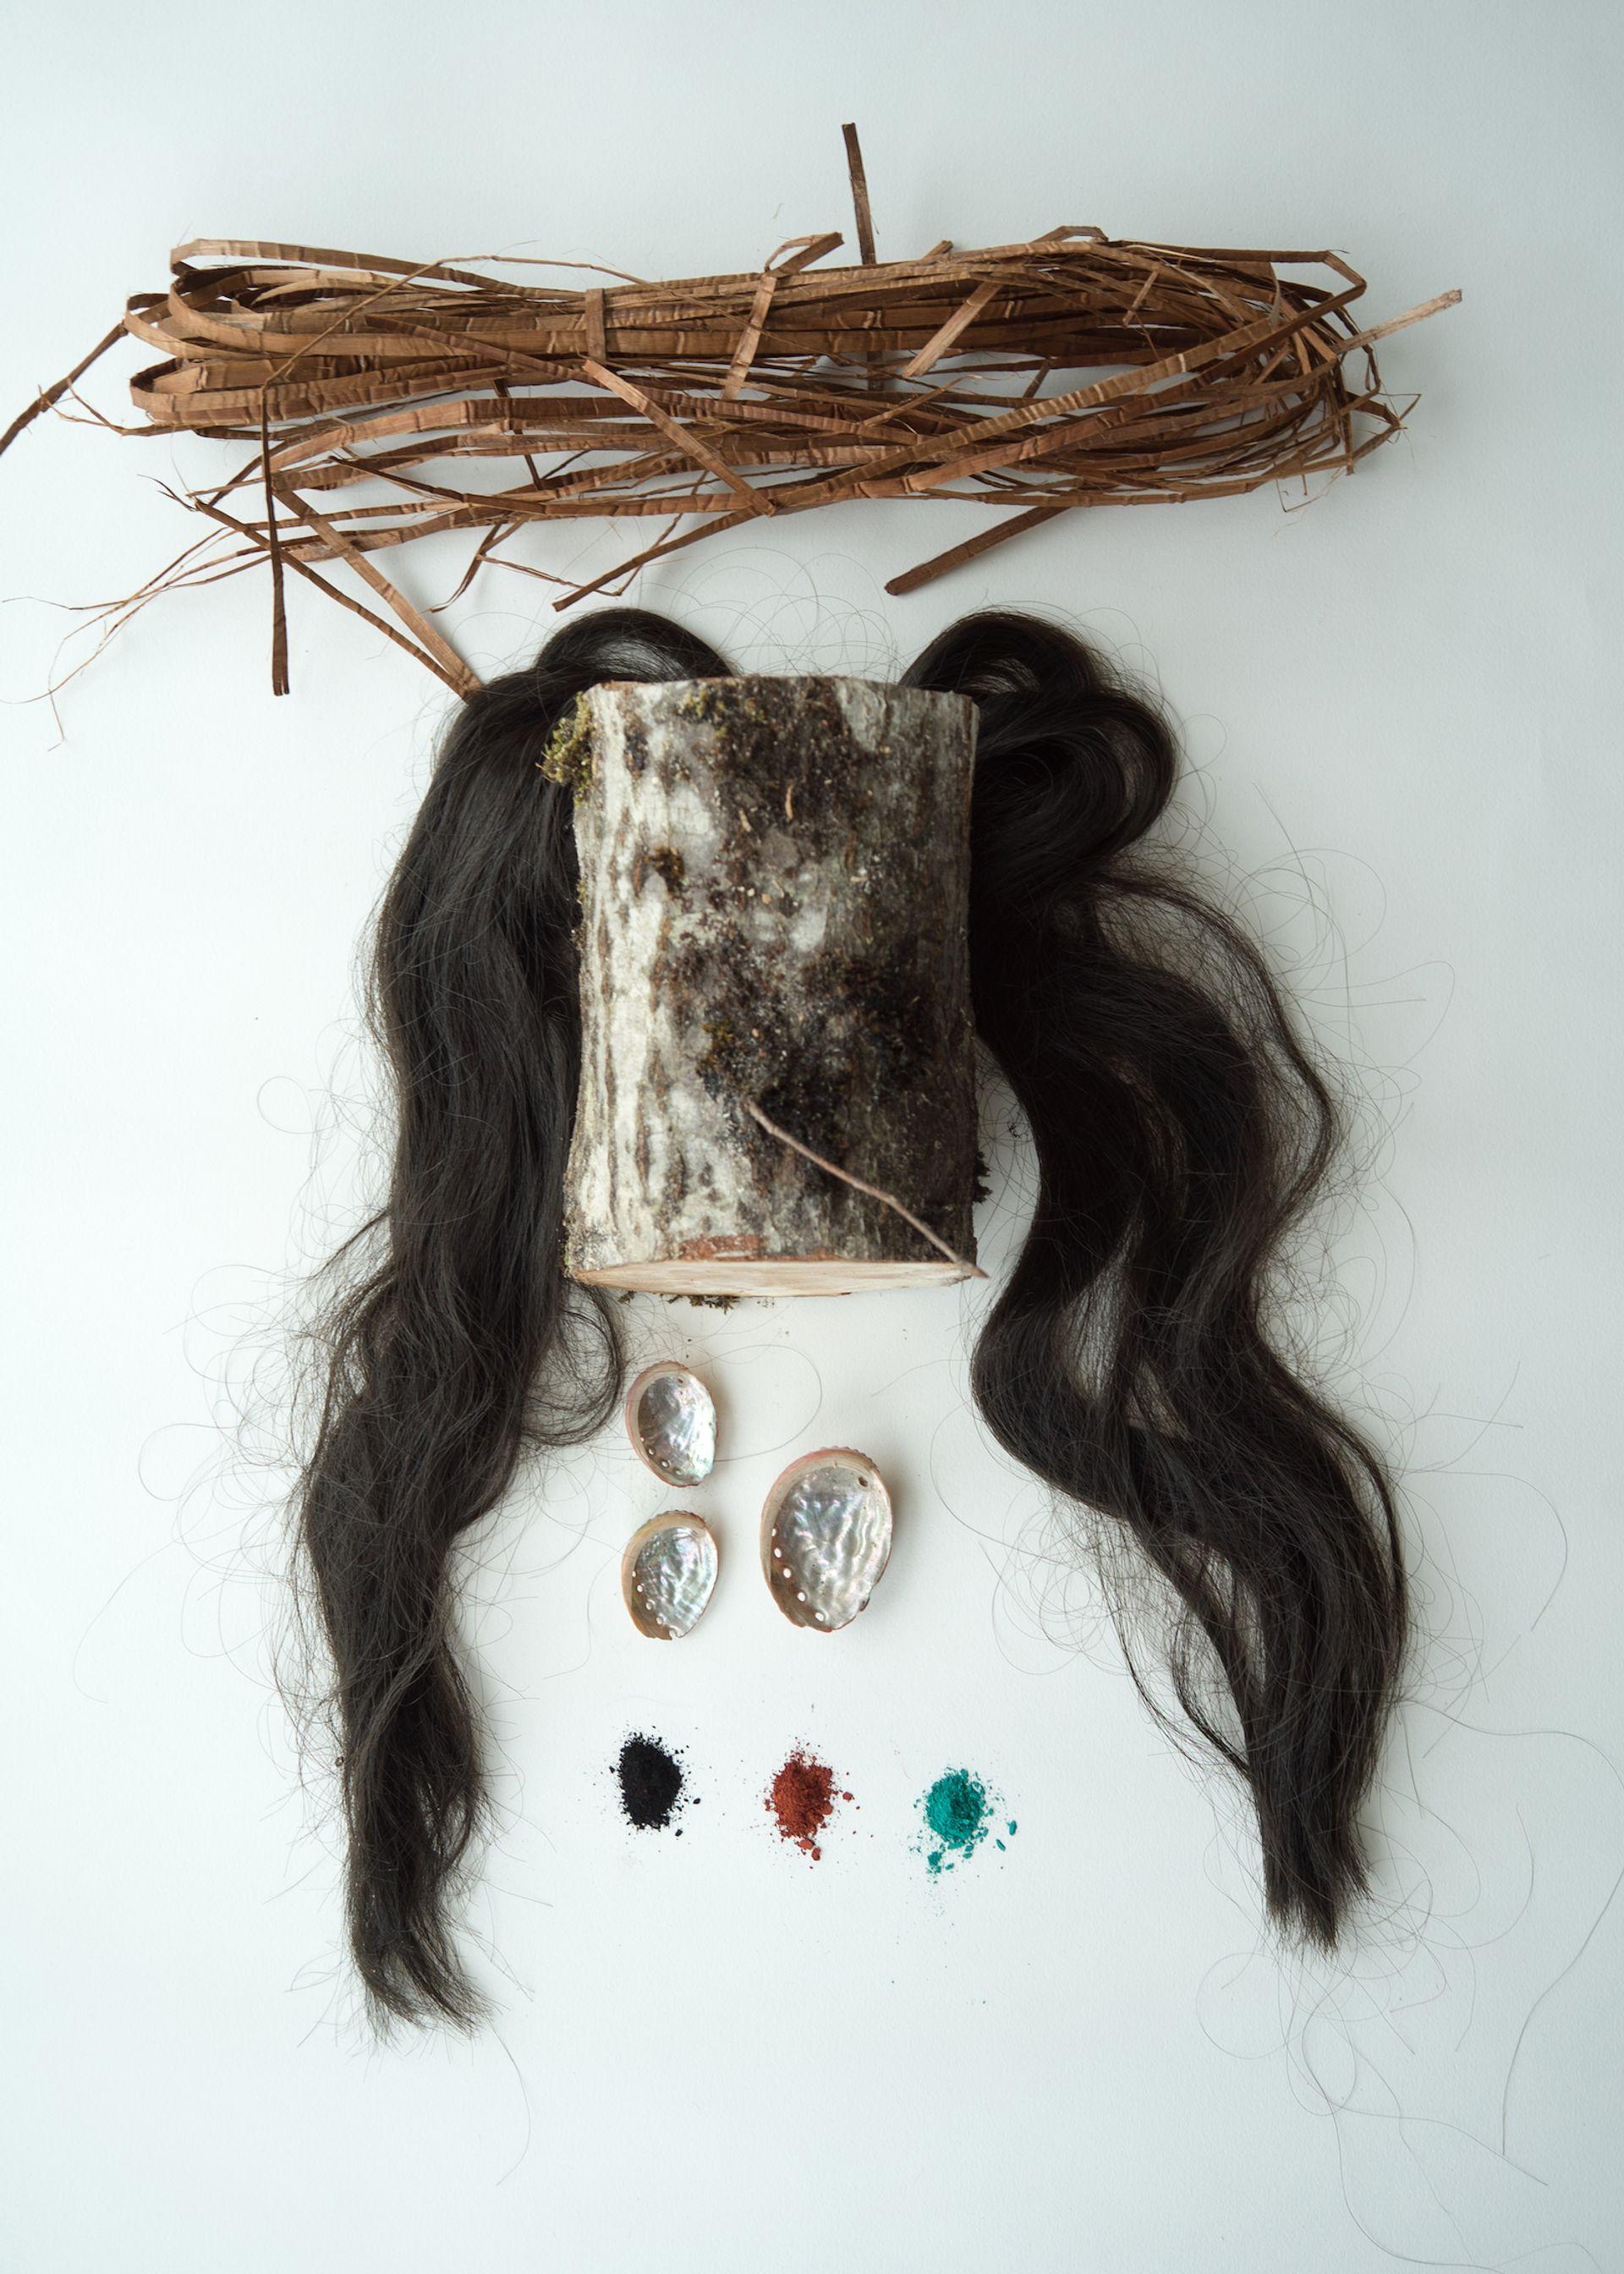 Nicholas Galanin, And call healing spirits (Intellectual Property) Courtesy of Nicholas Galanin and Peter Blum Gallery